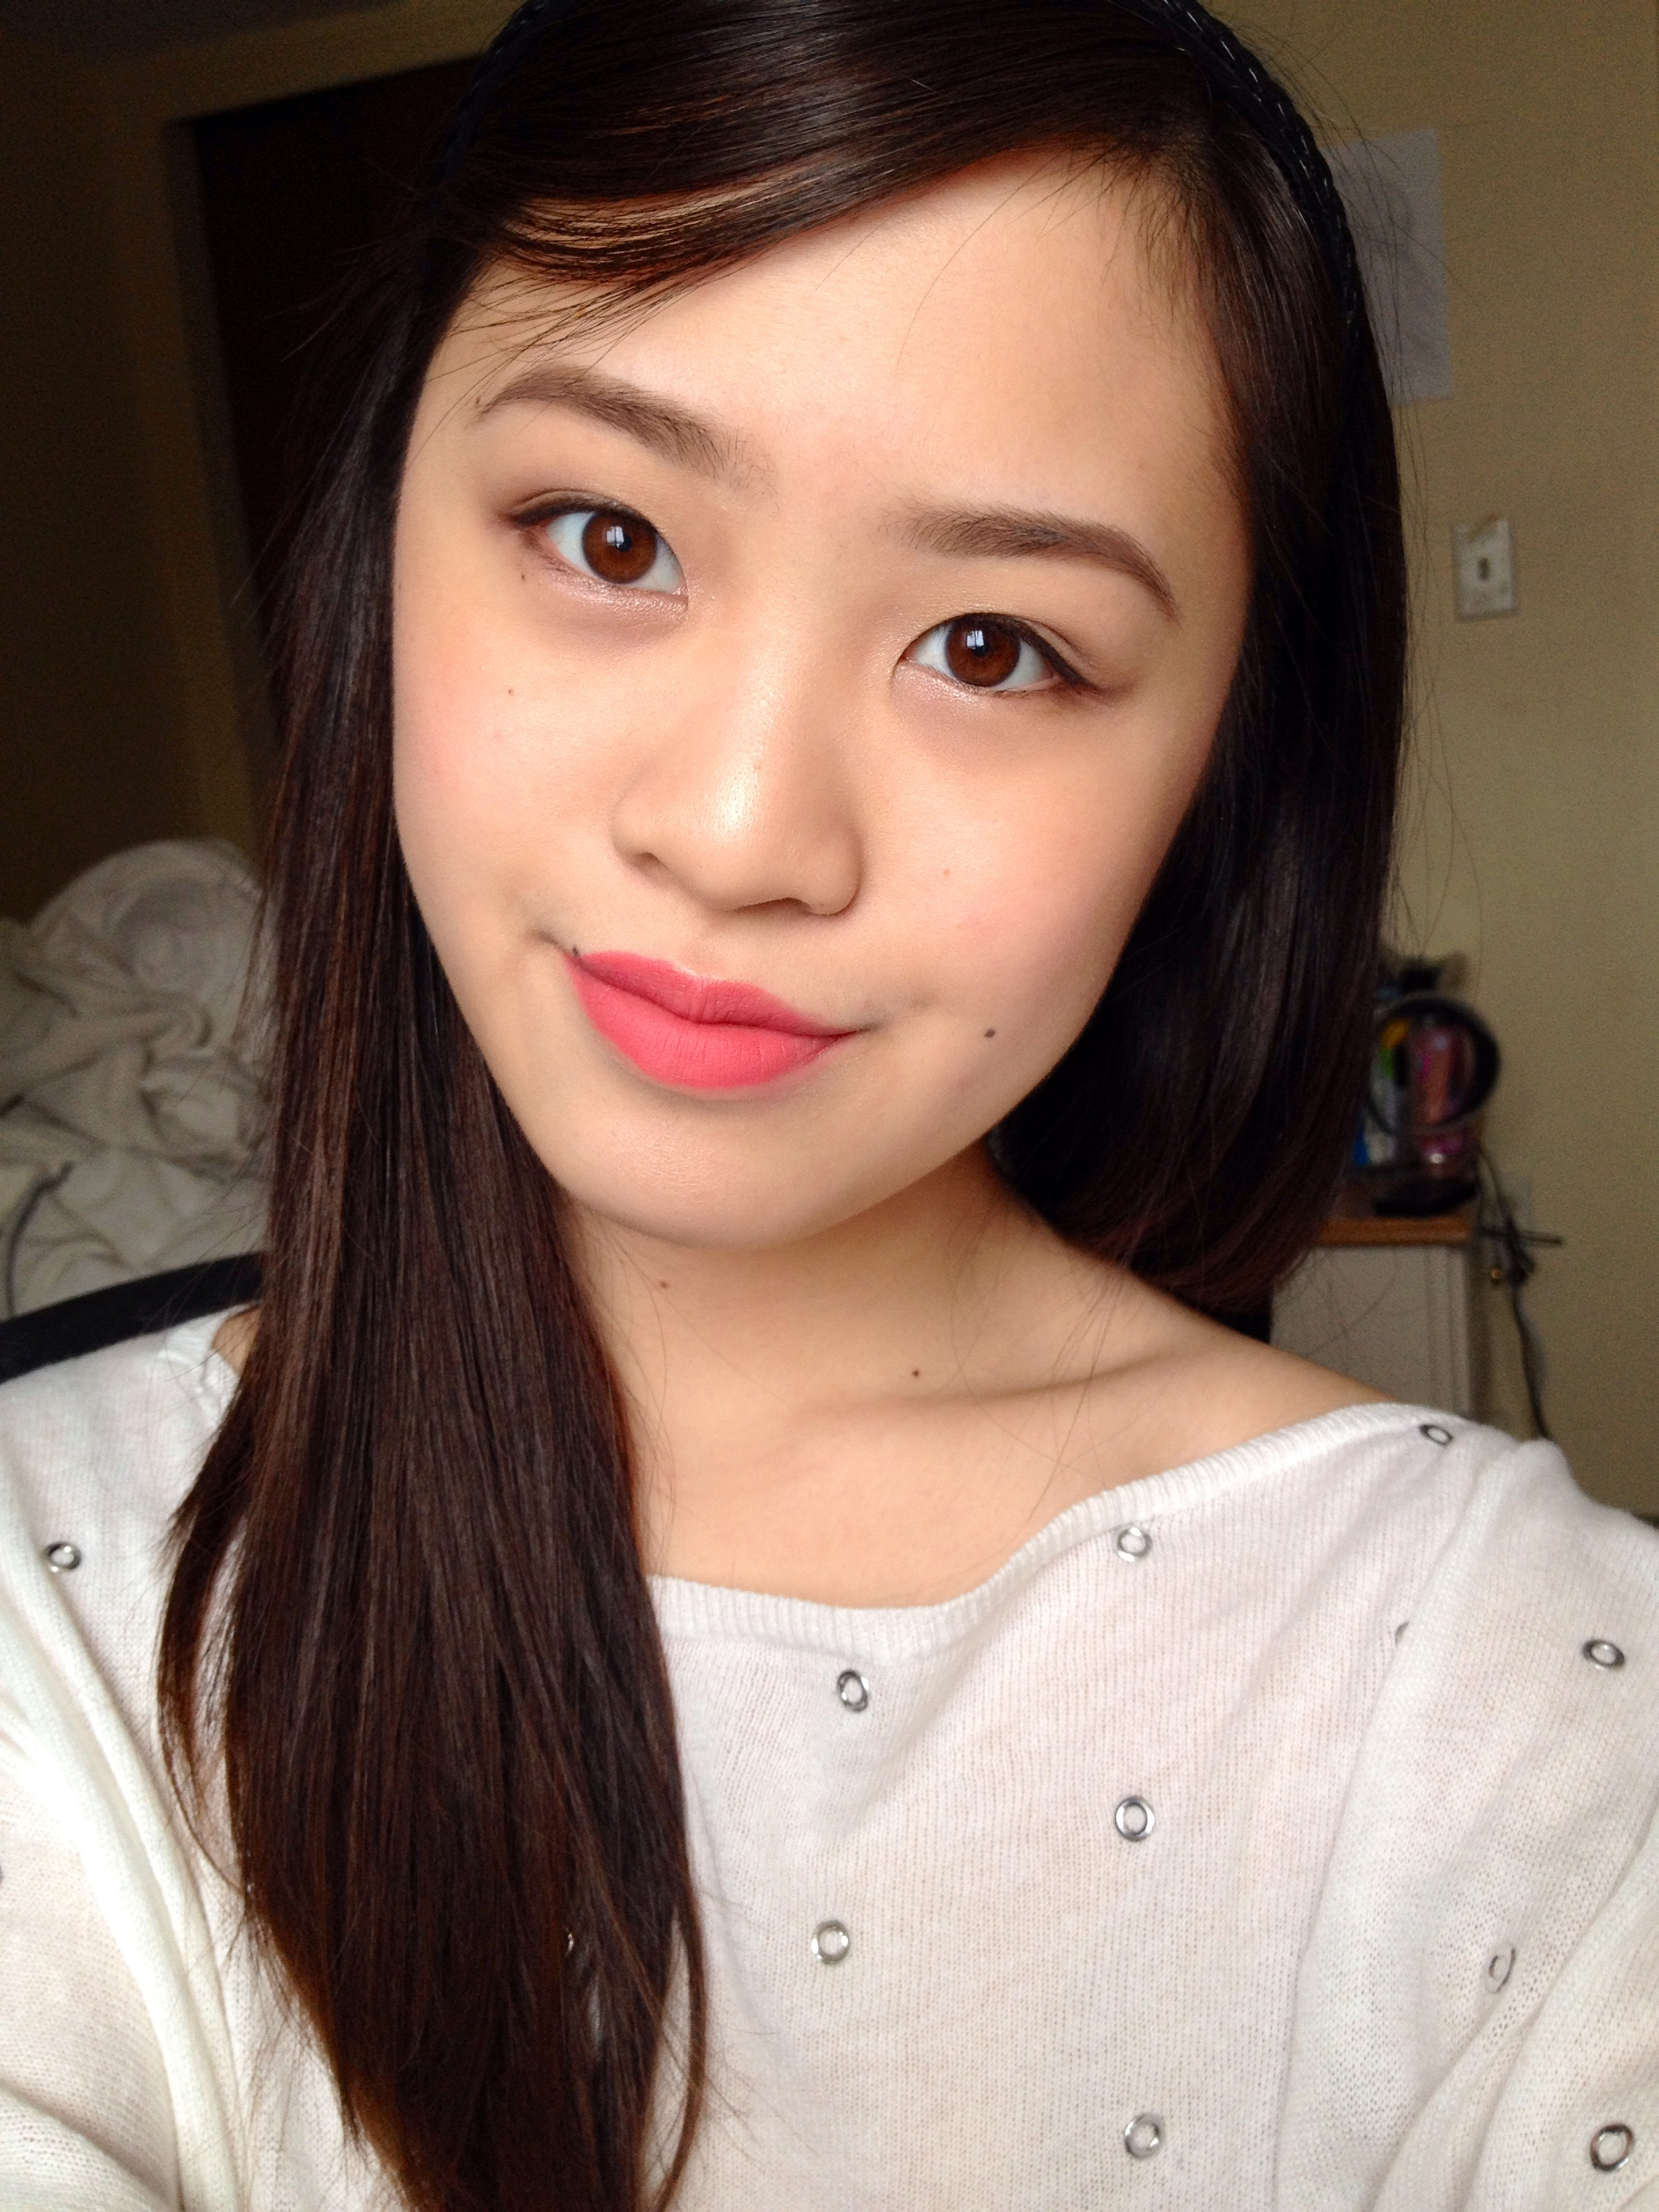 Ternyata memang ada tips dan pilihan warna sendiri untuk lipstick yang digunakan bagi pemilik kulit kuning langsat ya girls